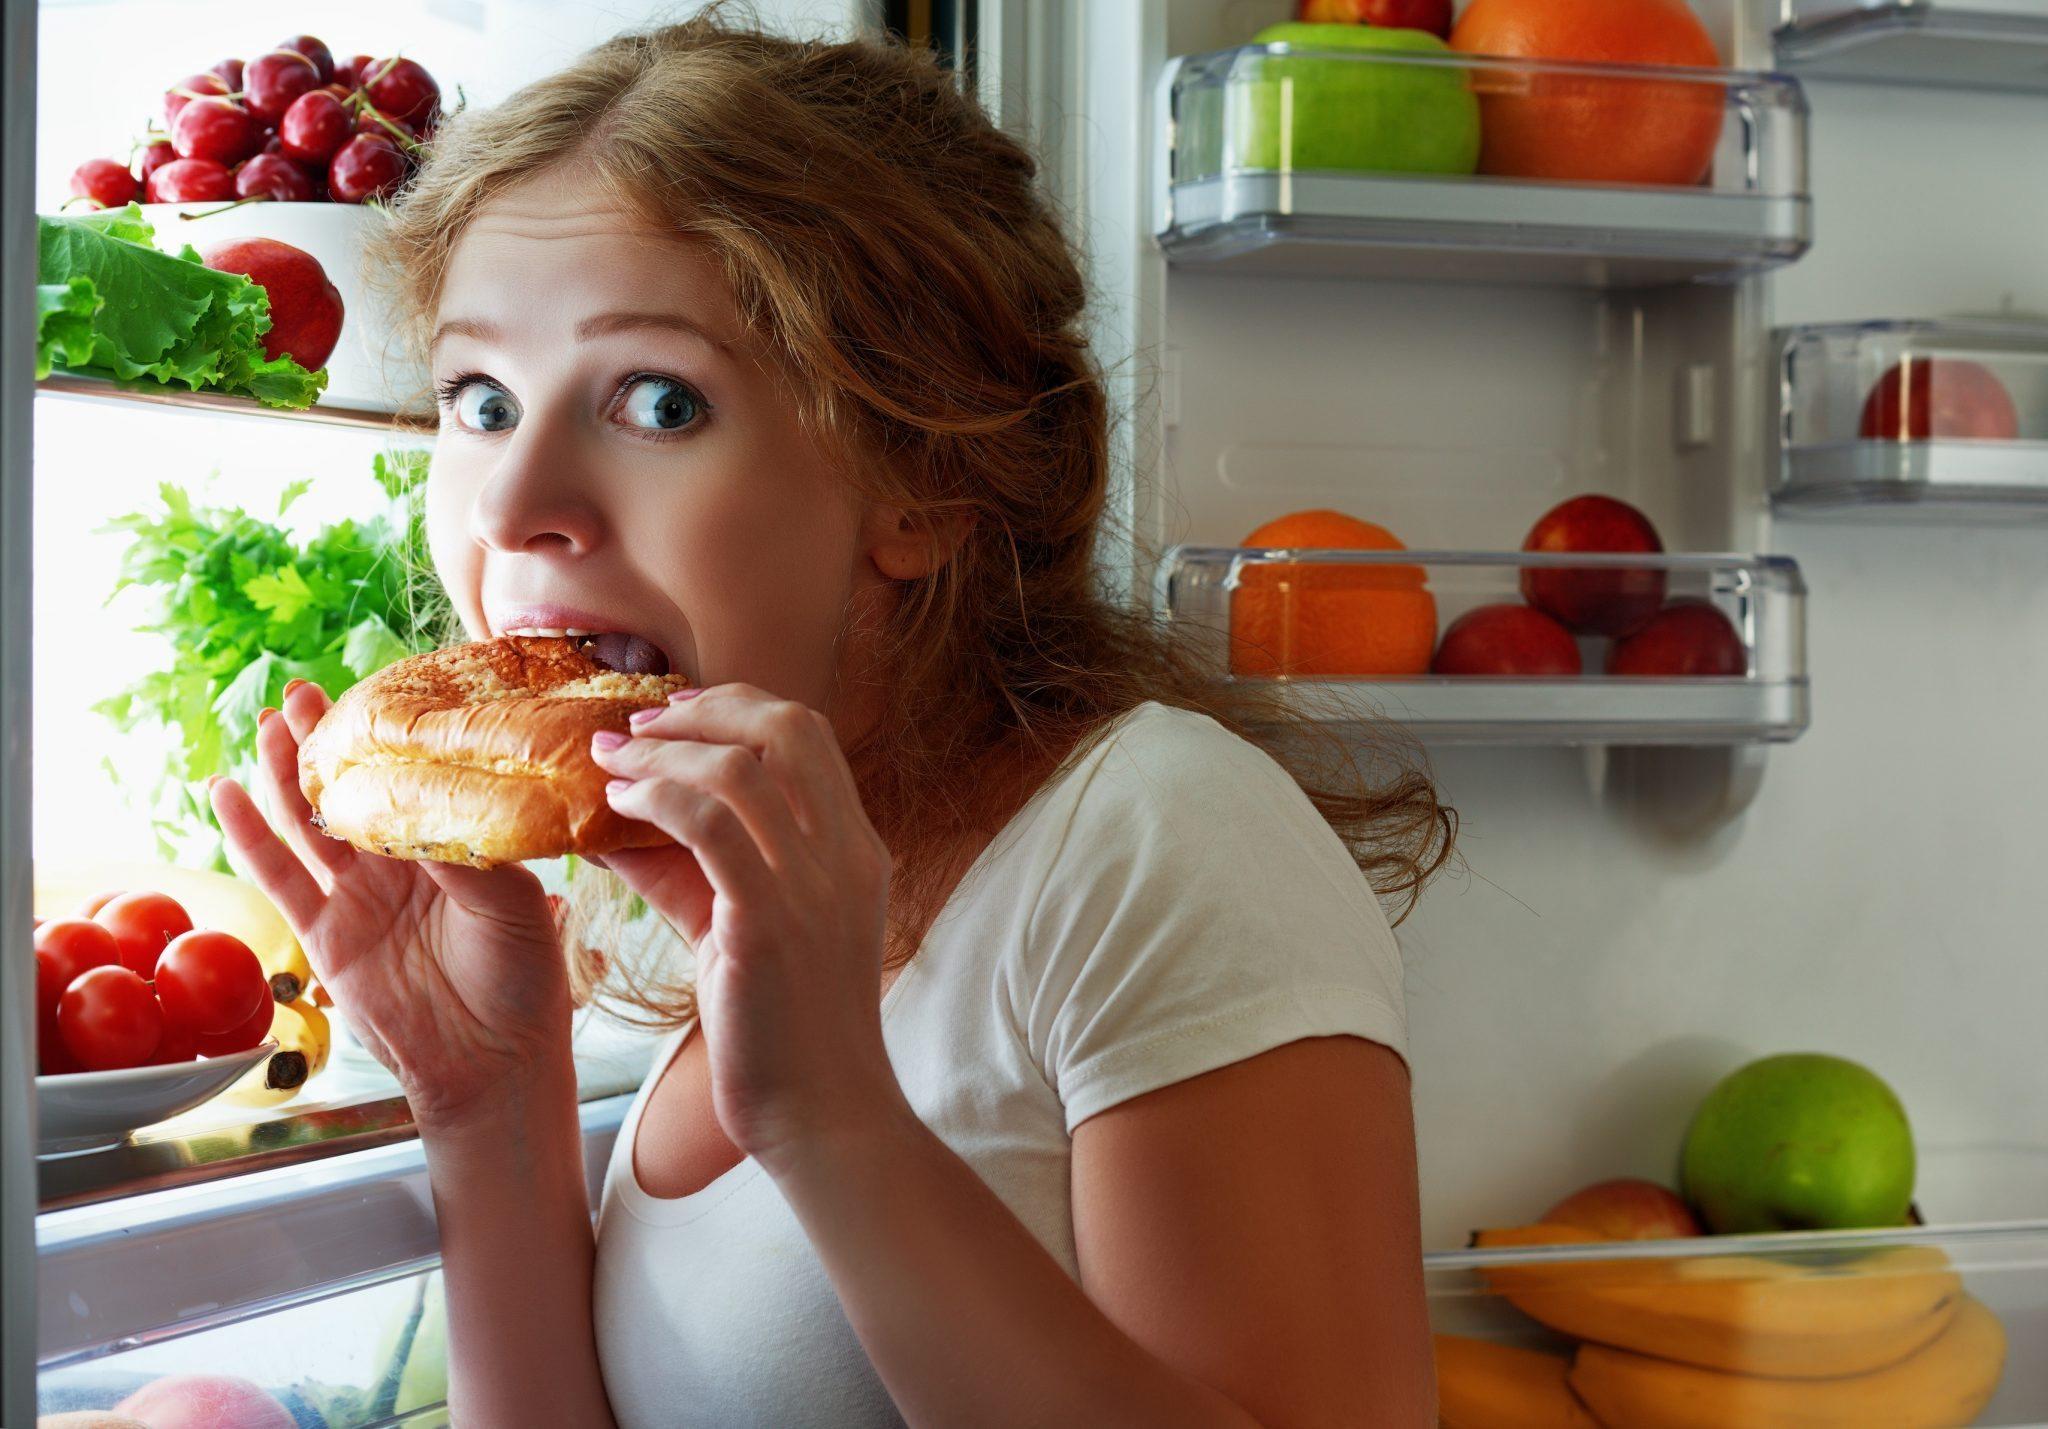 Девушка ест булочку у холодильника